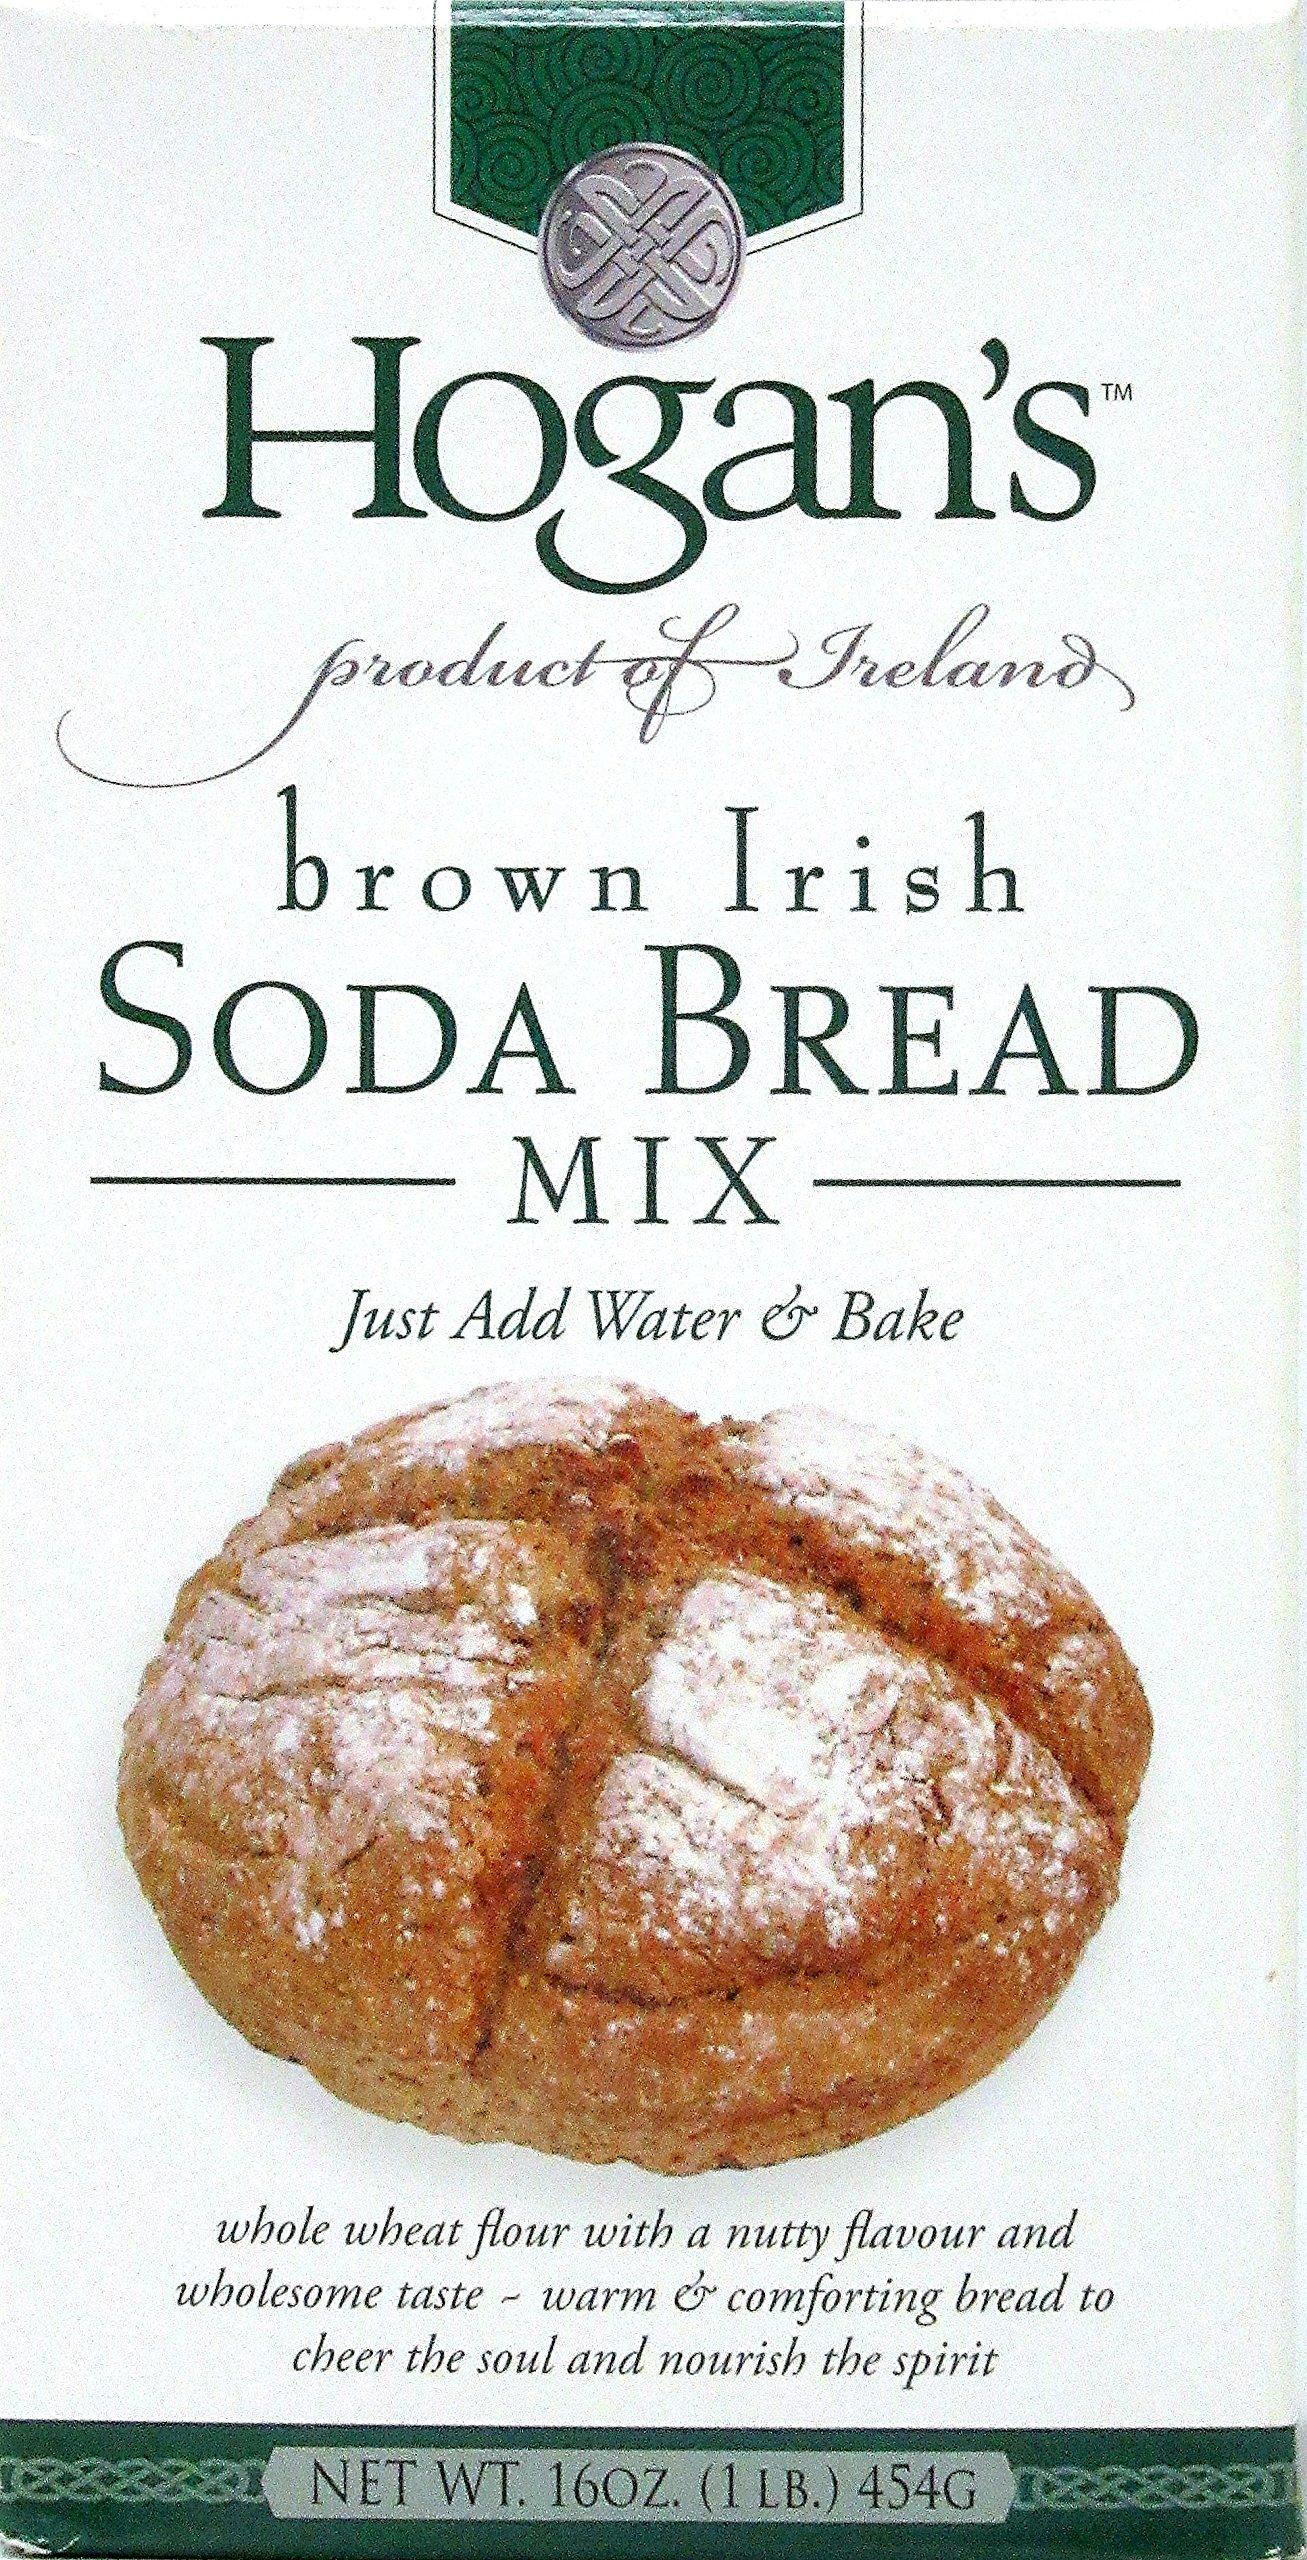 Hogan's Brown Irish Soda Bread Mix, 1 Pound